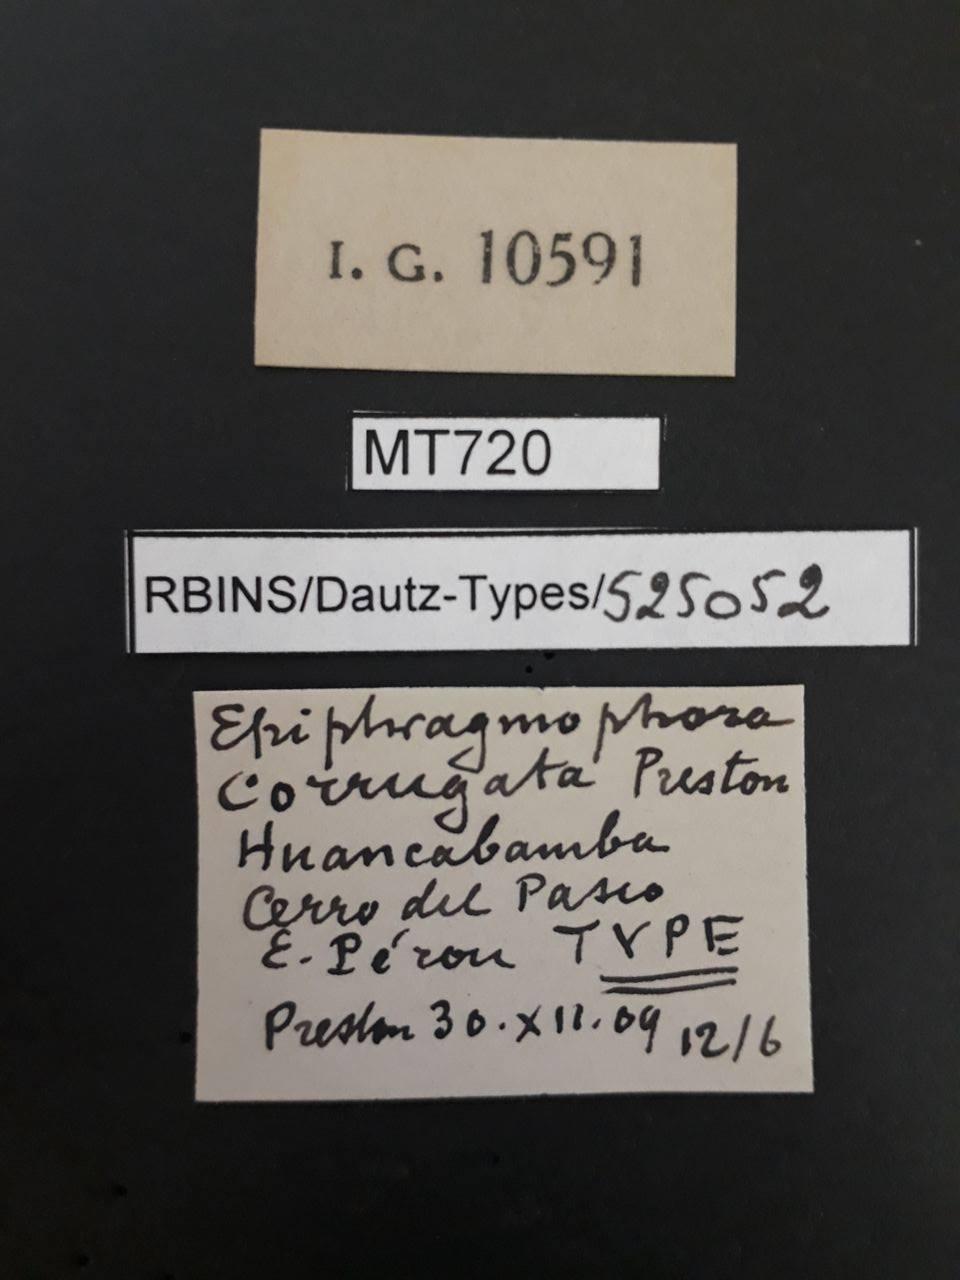 BE-RBINS-INV MT 720 Epiphragmophora corrugata t Lb.jpg